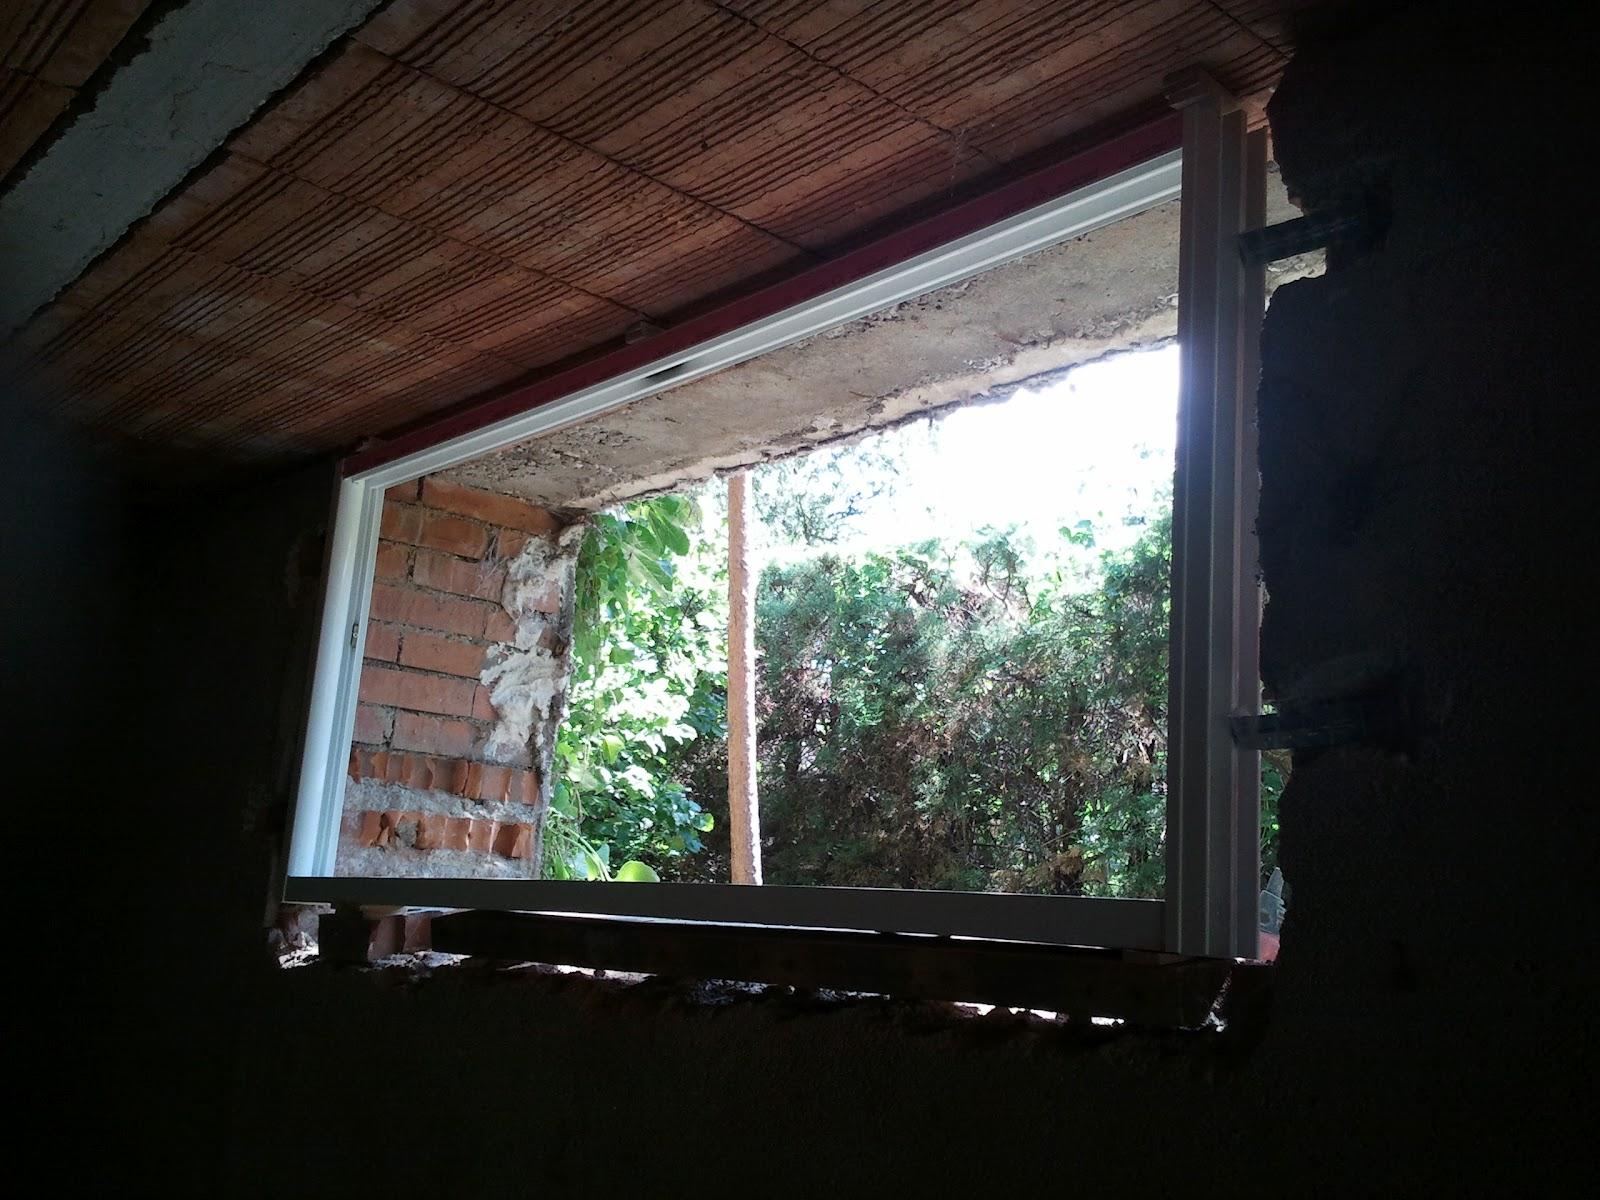 Instalacion de ventanas de aluminio sotano for Instalacion de ventanas de aluminio